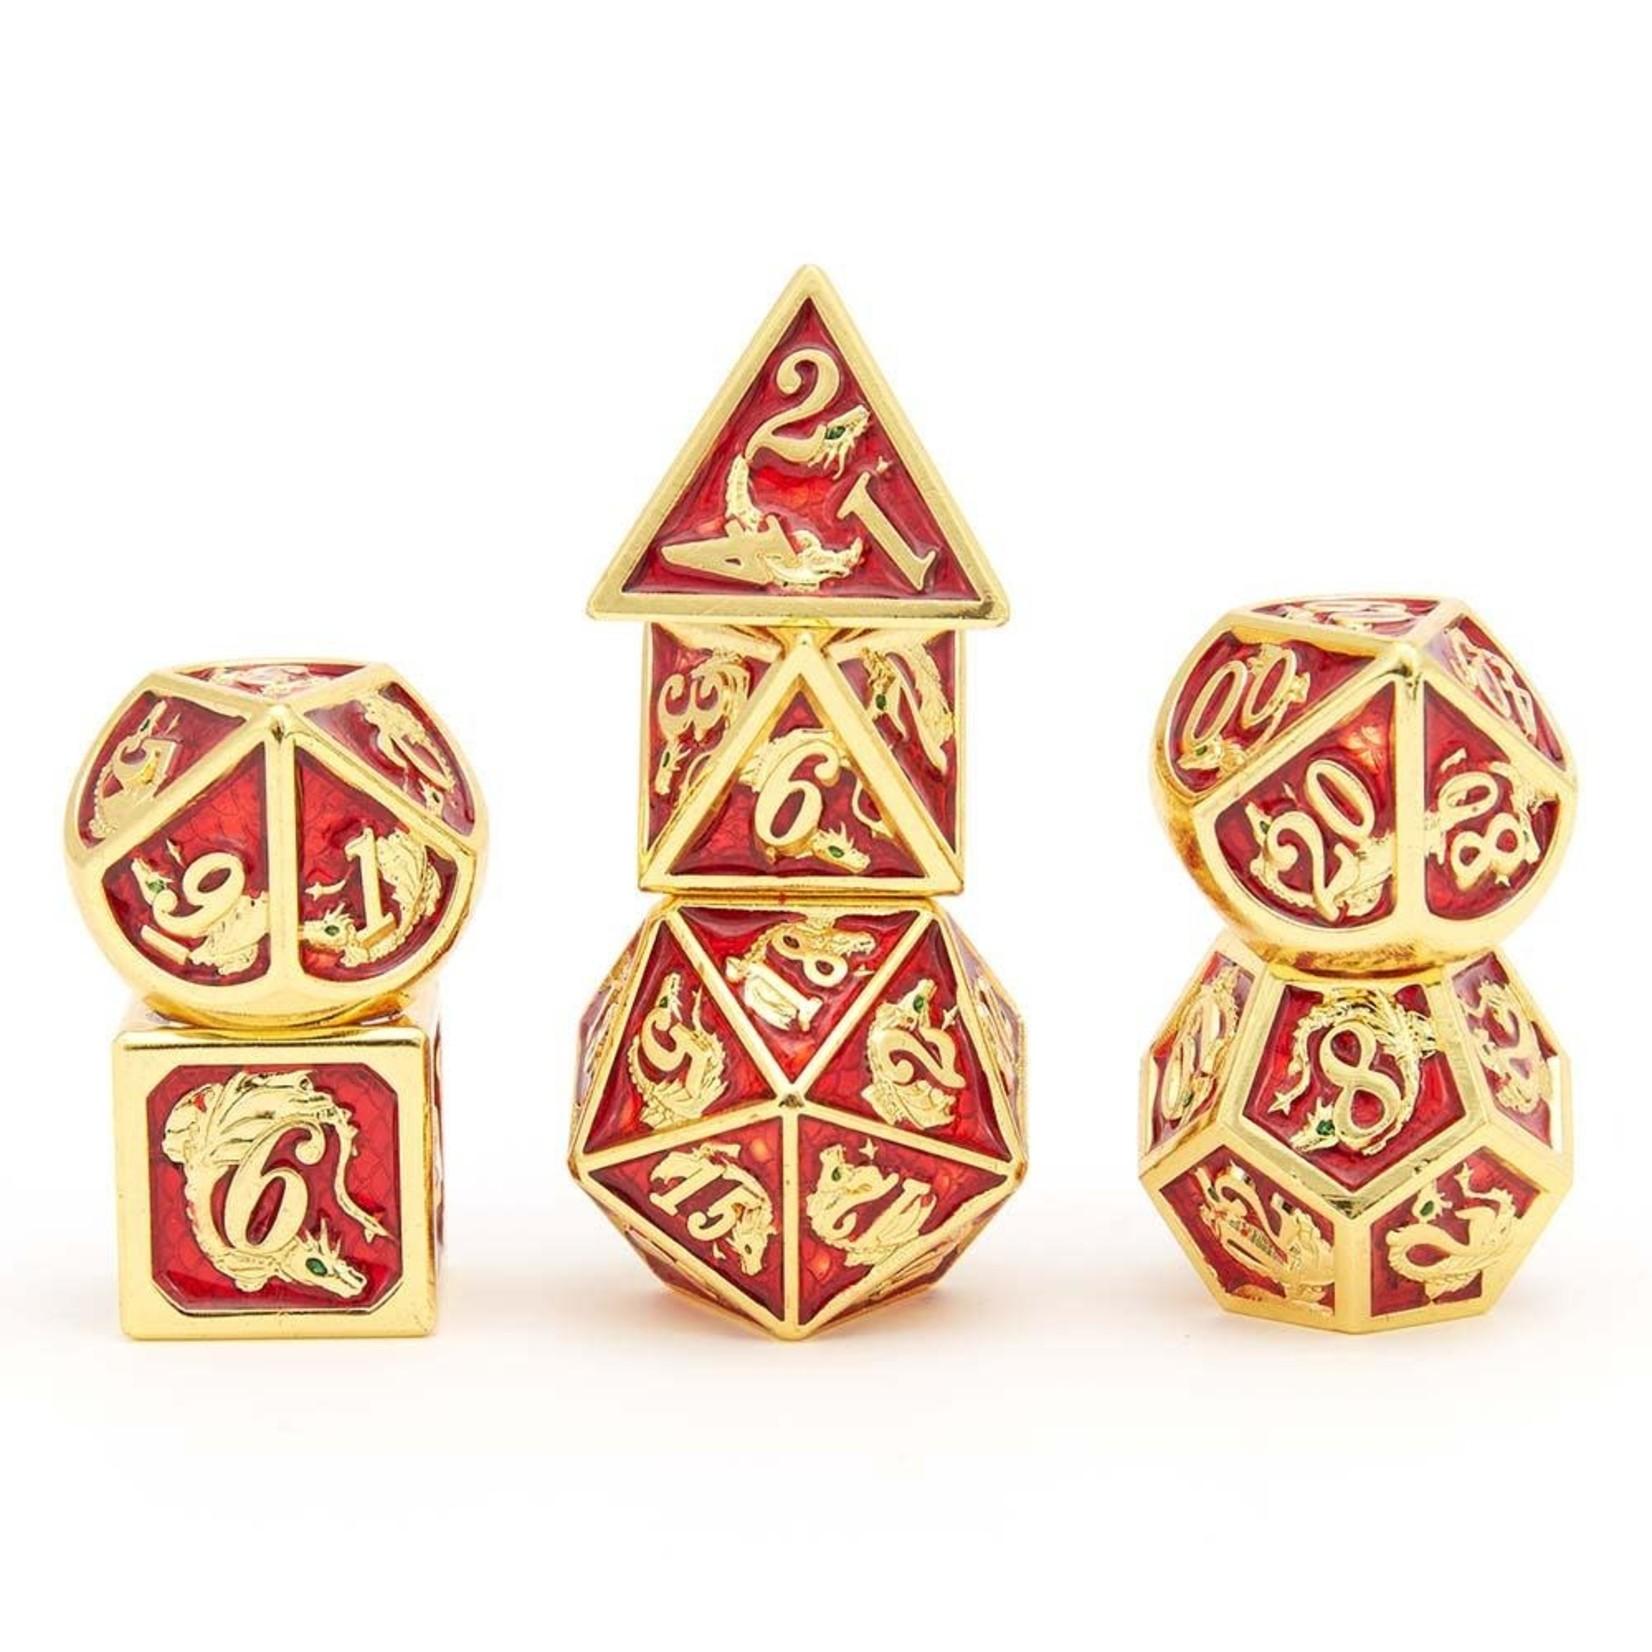 Hymgho Dice US Hymgho 7-Set Metal Dragon Gold with Red Dice